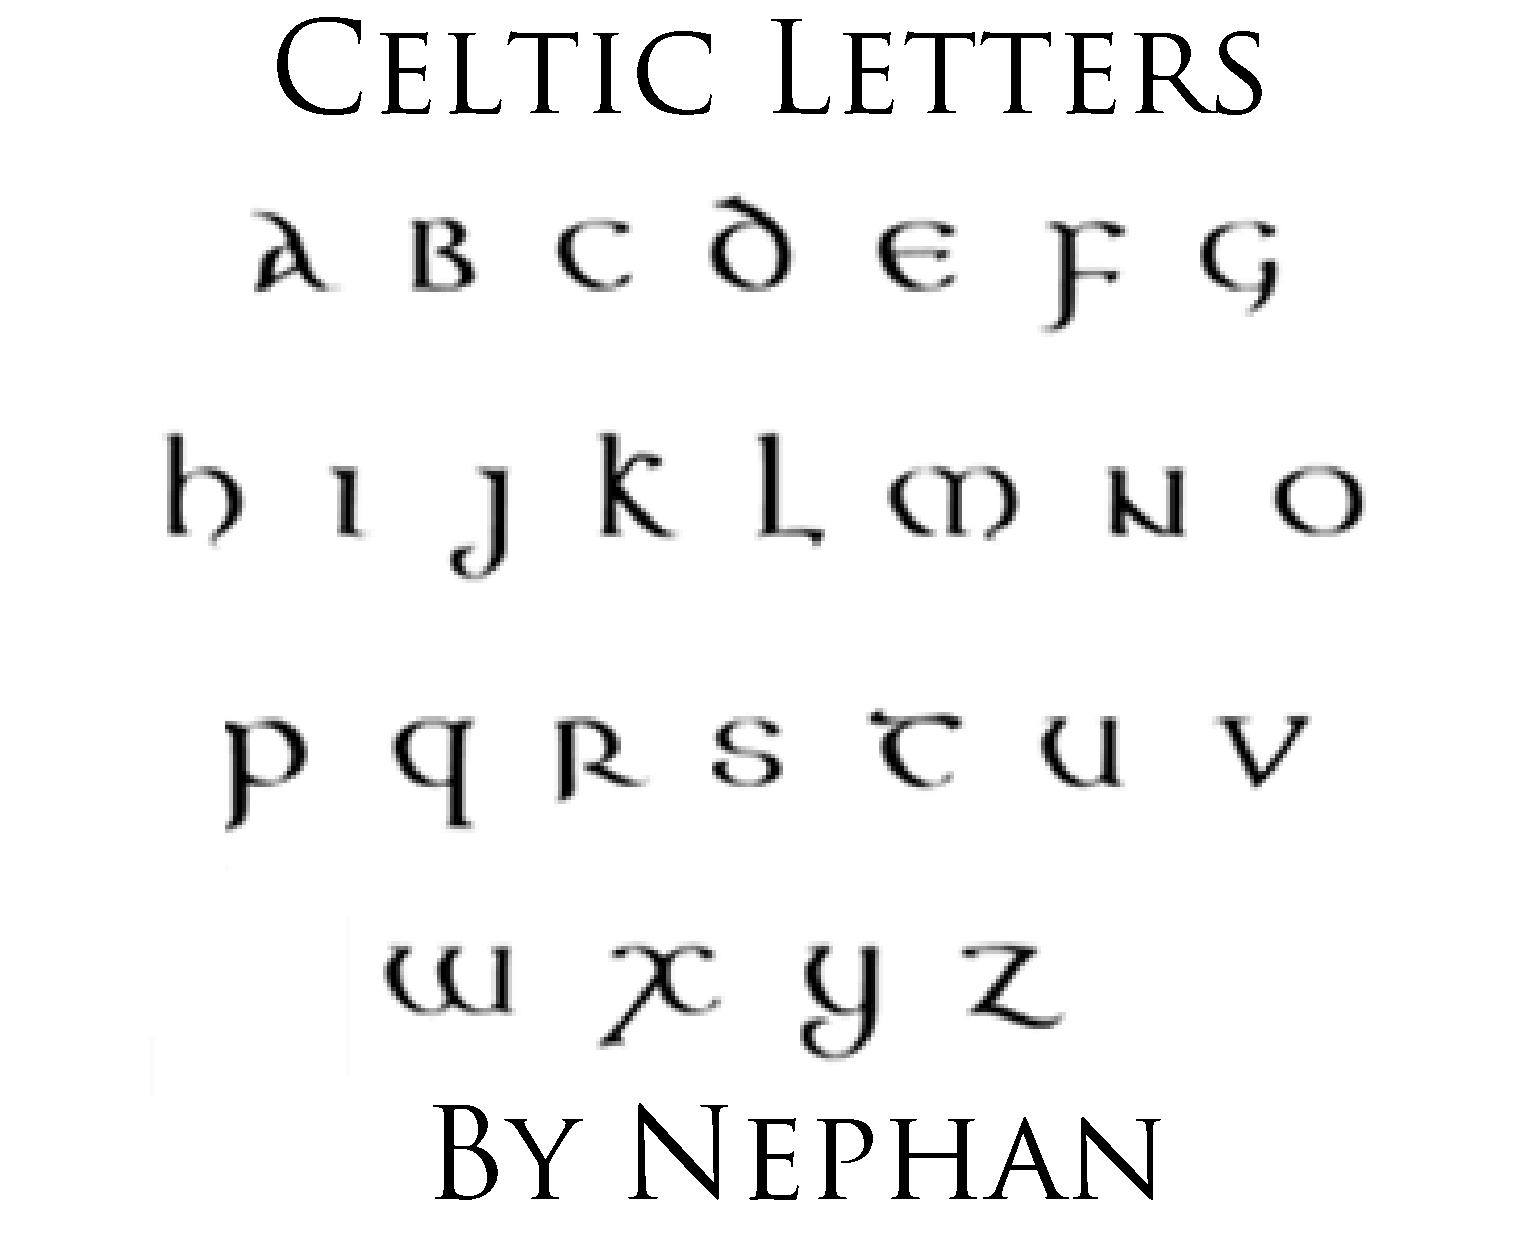 Celtic Letters By Nephan On Deviantart